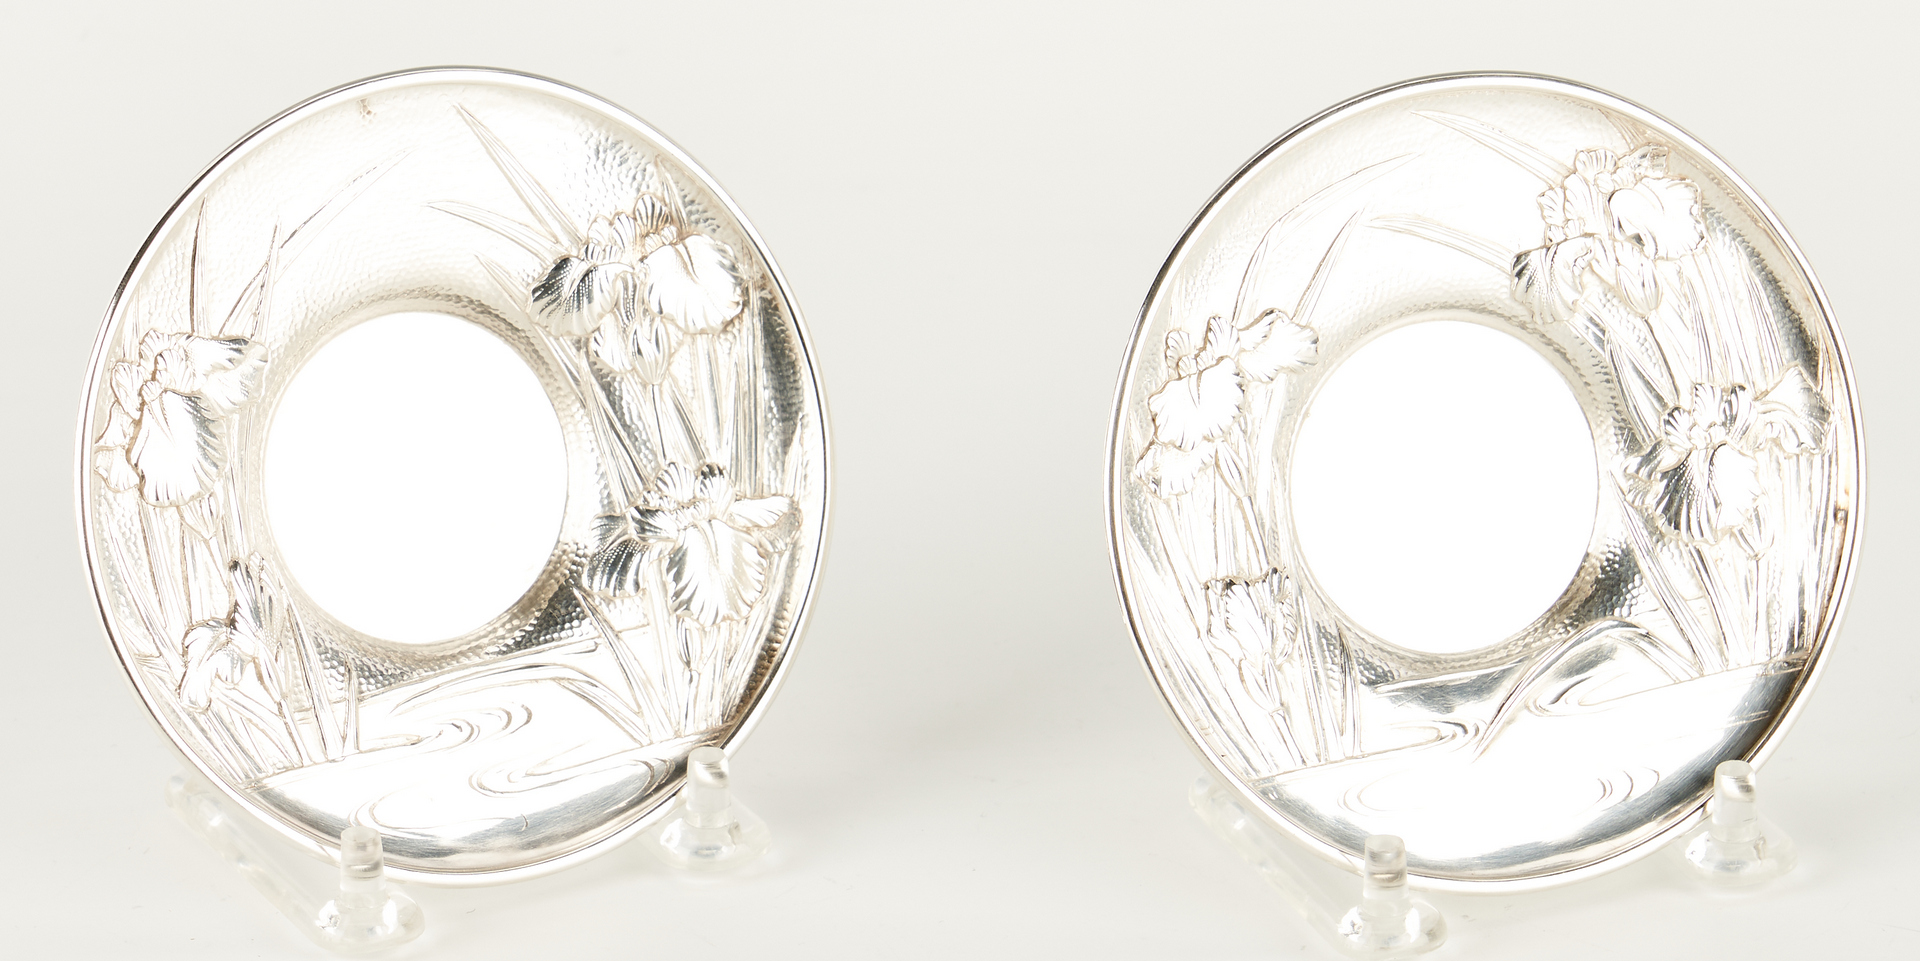 Lot 4: Meiji Japanese Export Silver and Porcelain Teacup Set, 56 pcs